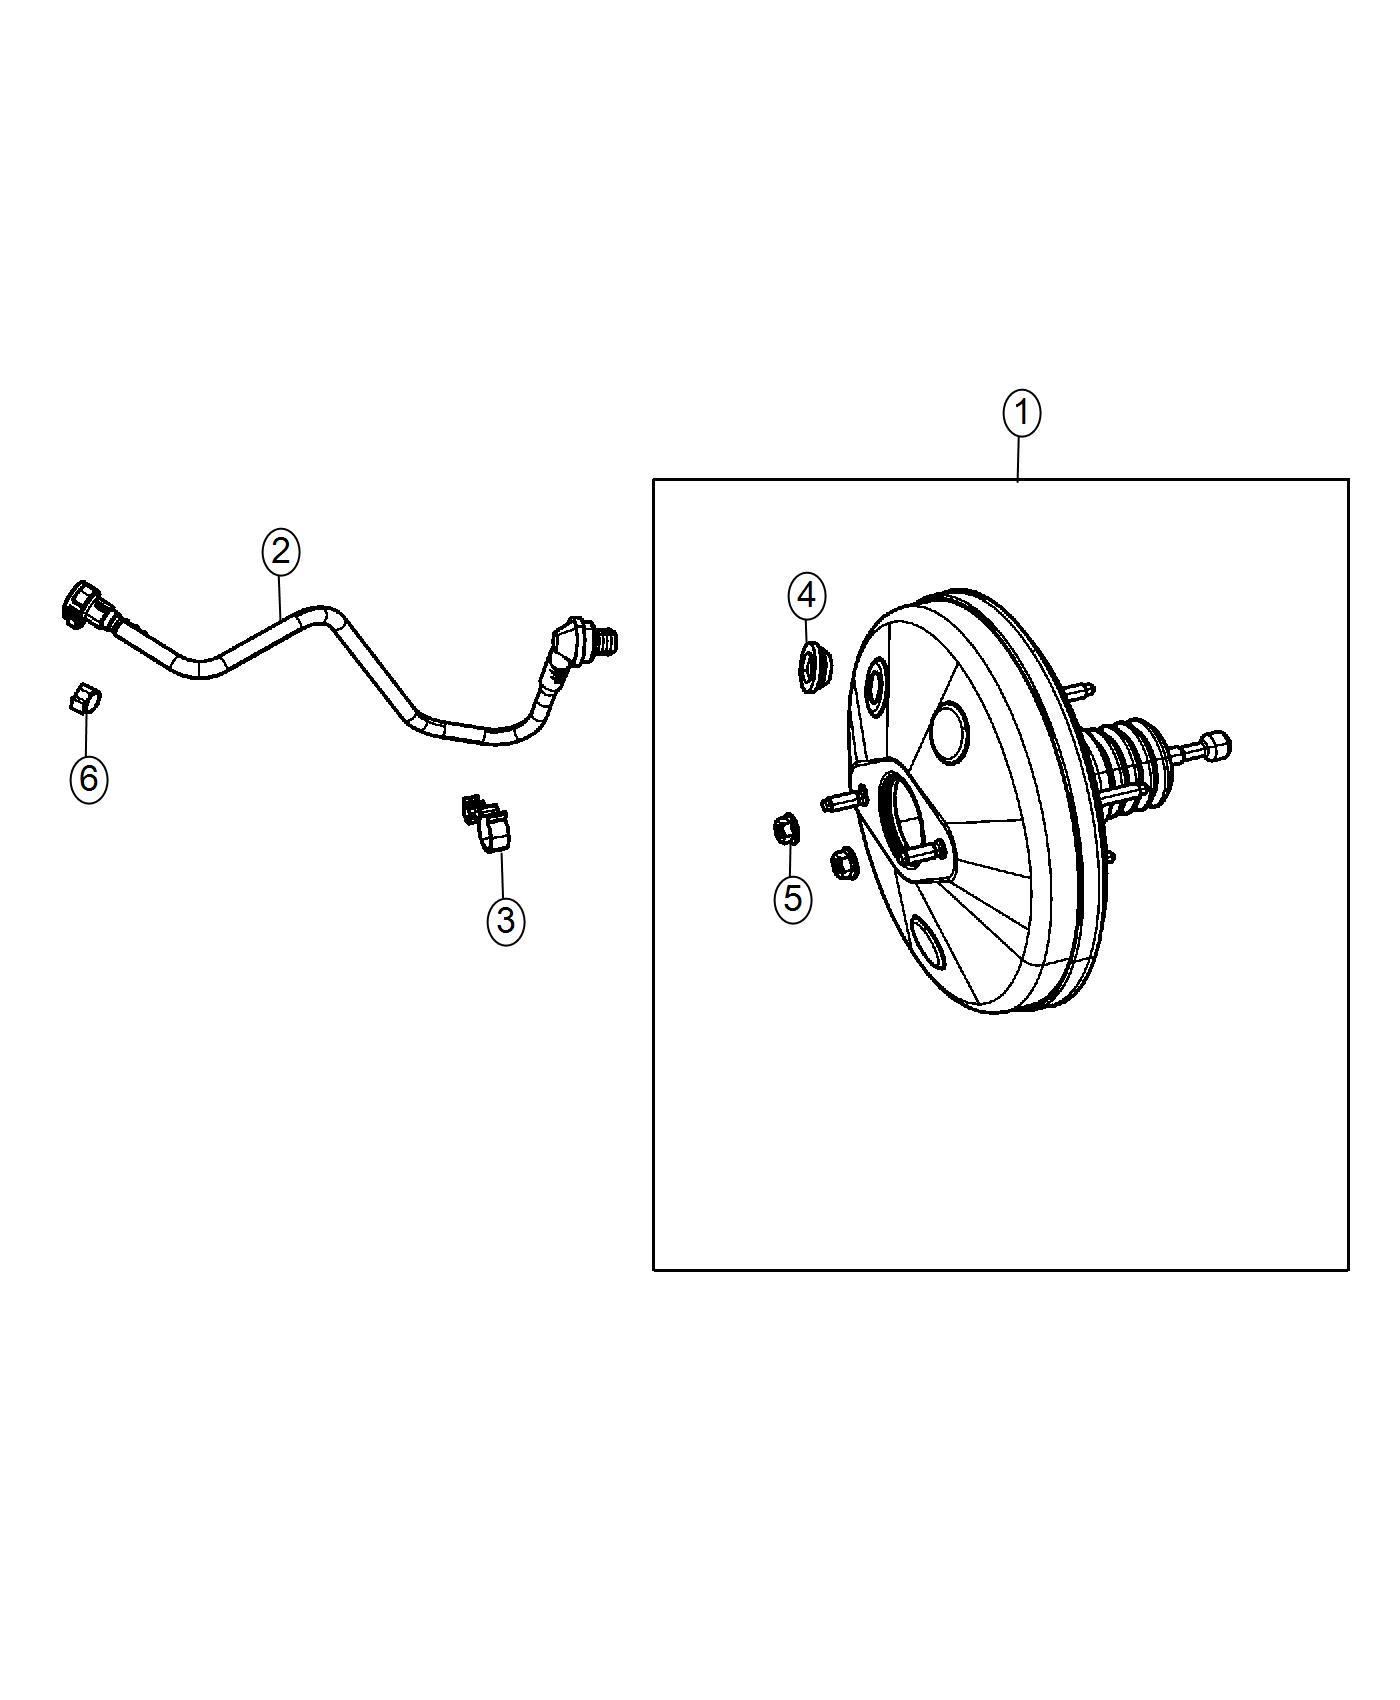 Fiat 500e Booster Power Brake 4 Wheel Disc Brakes